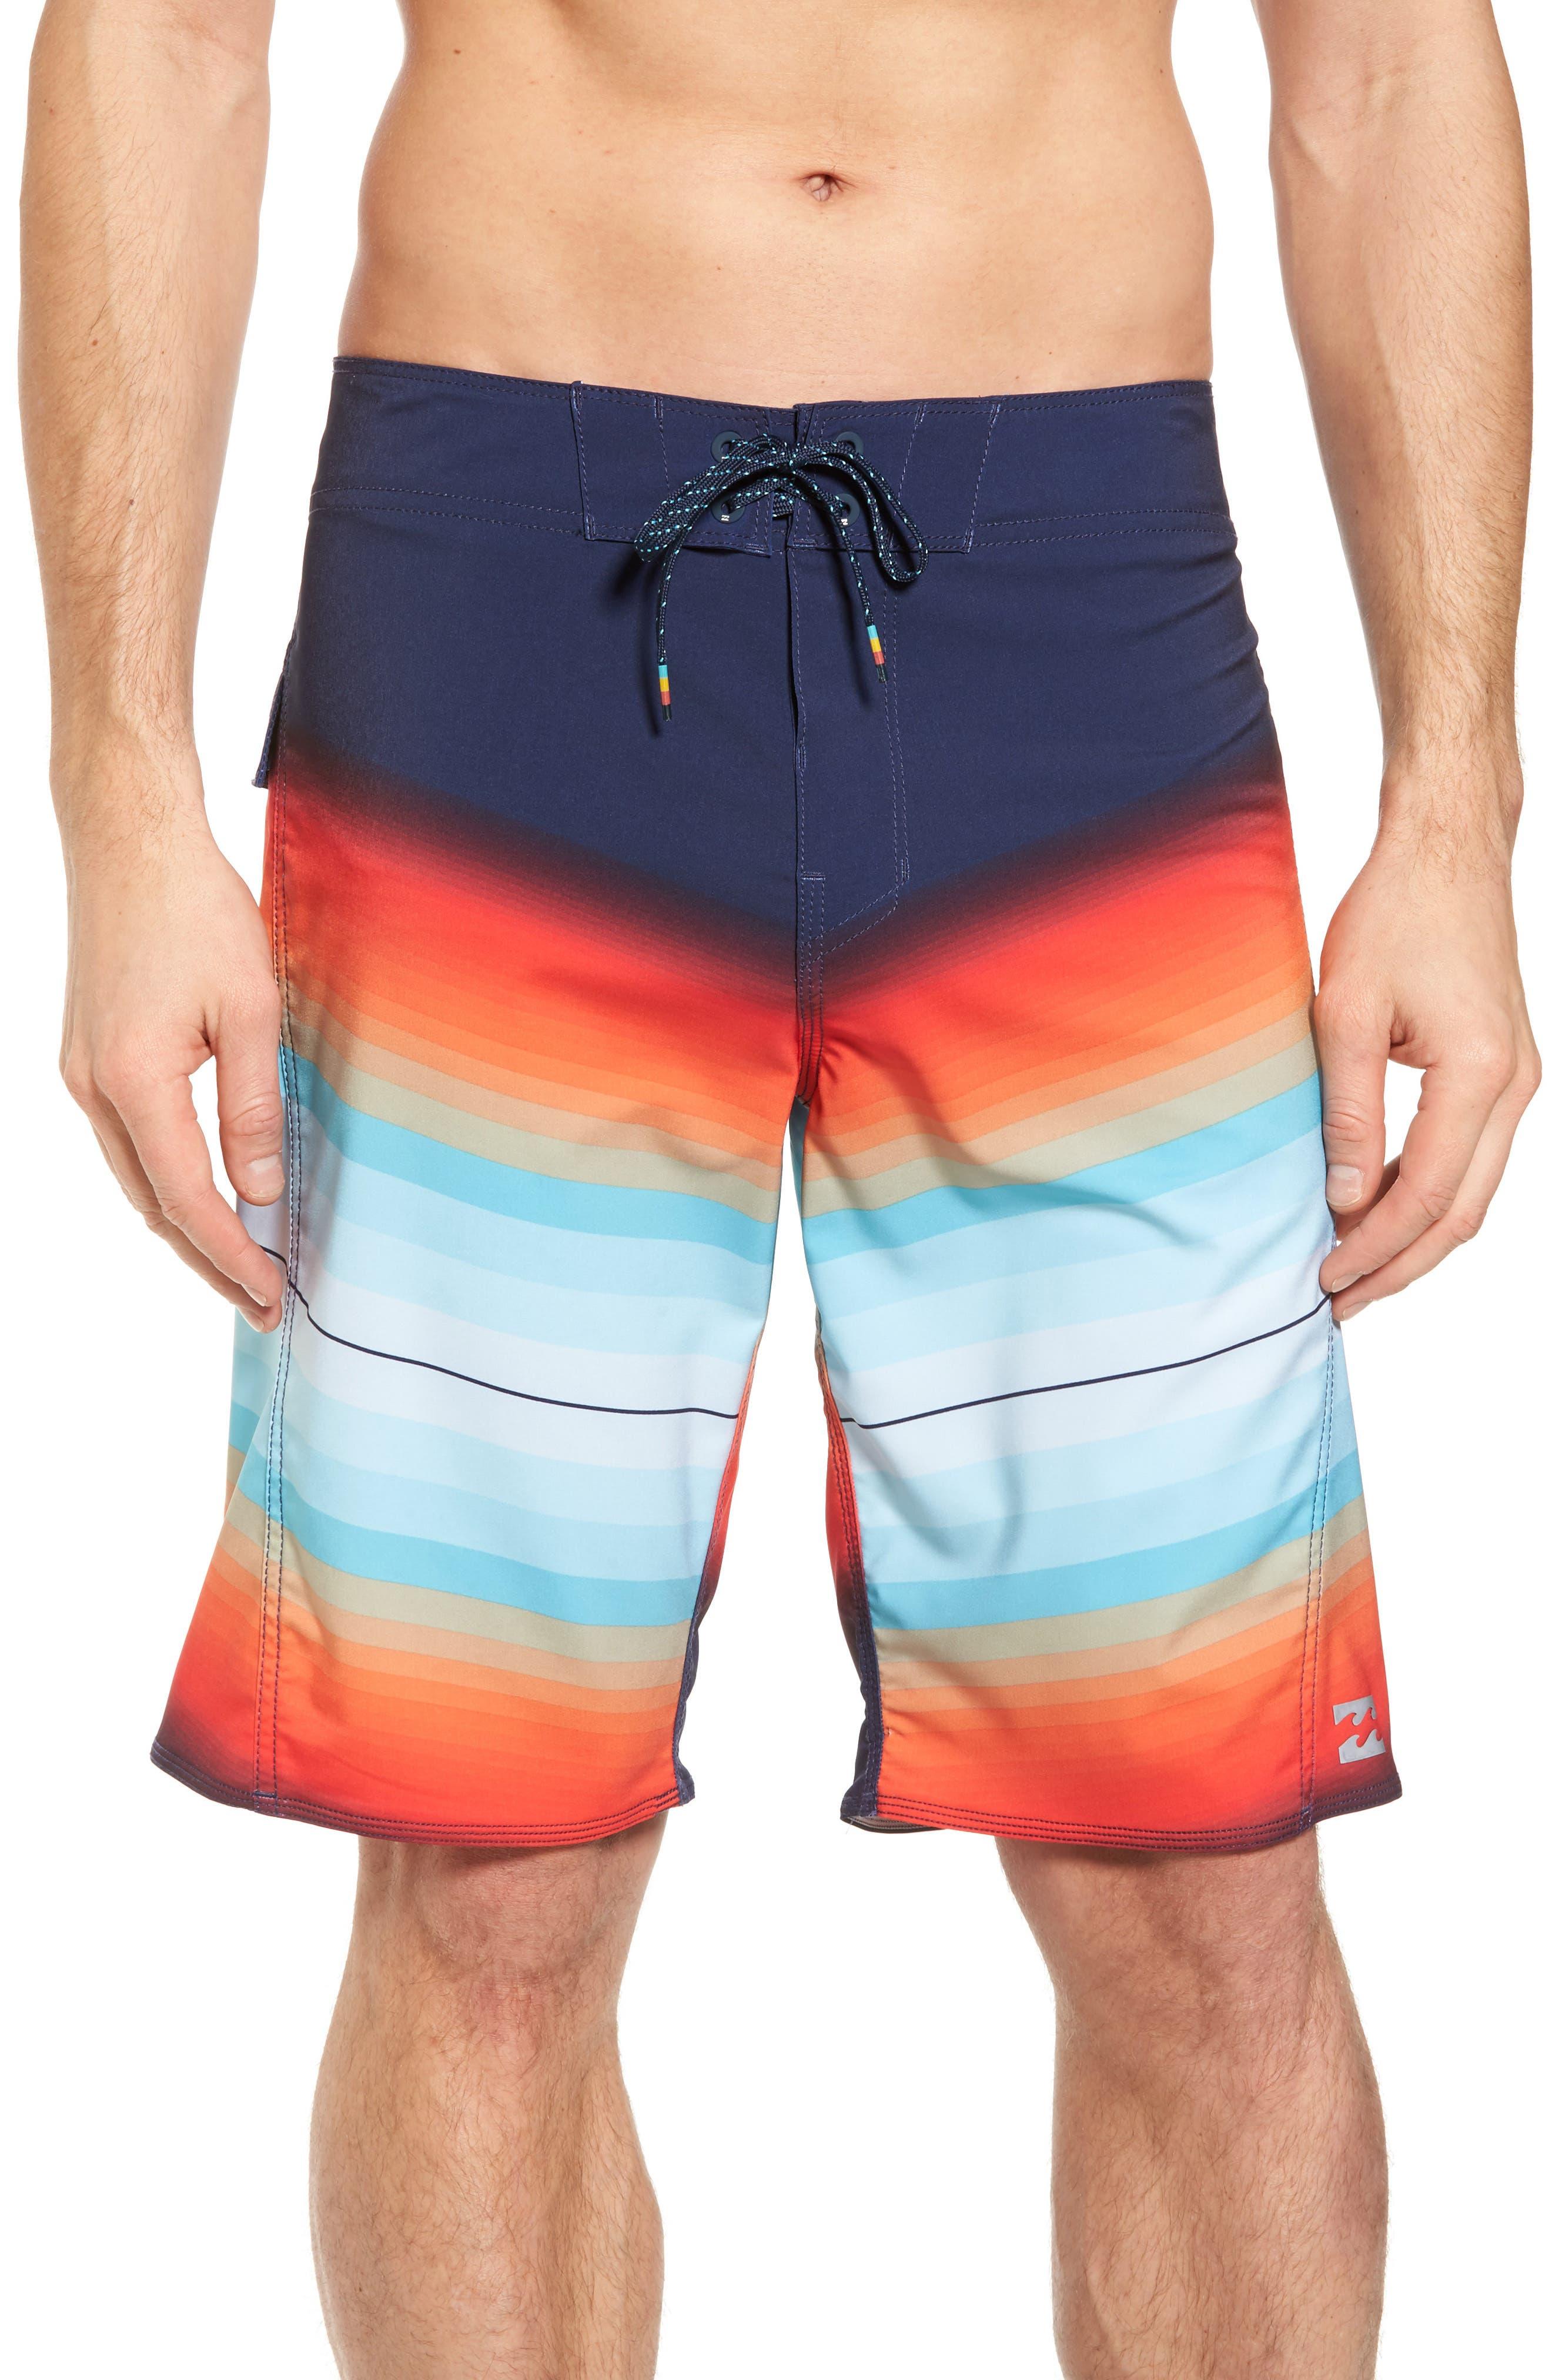 Fluid X Board Shorts,                             Main thumbnail 1, color,                             Orange